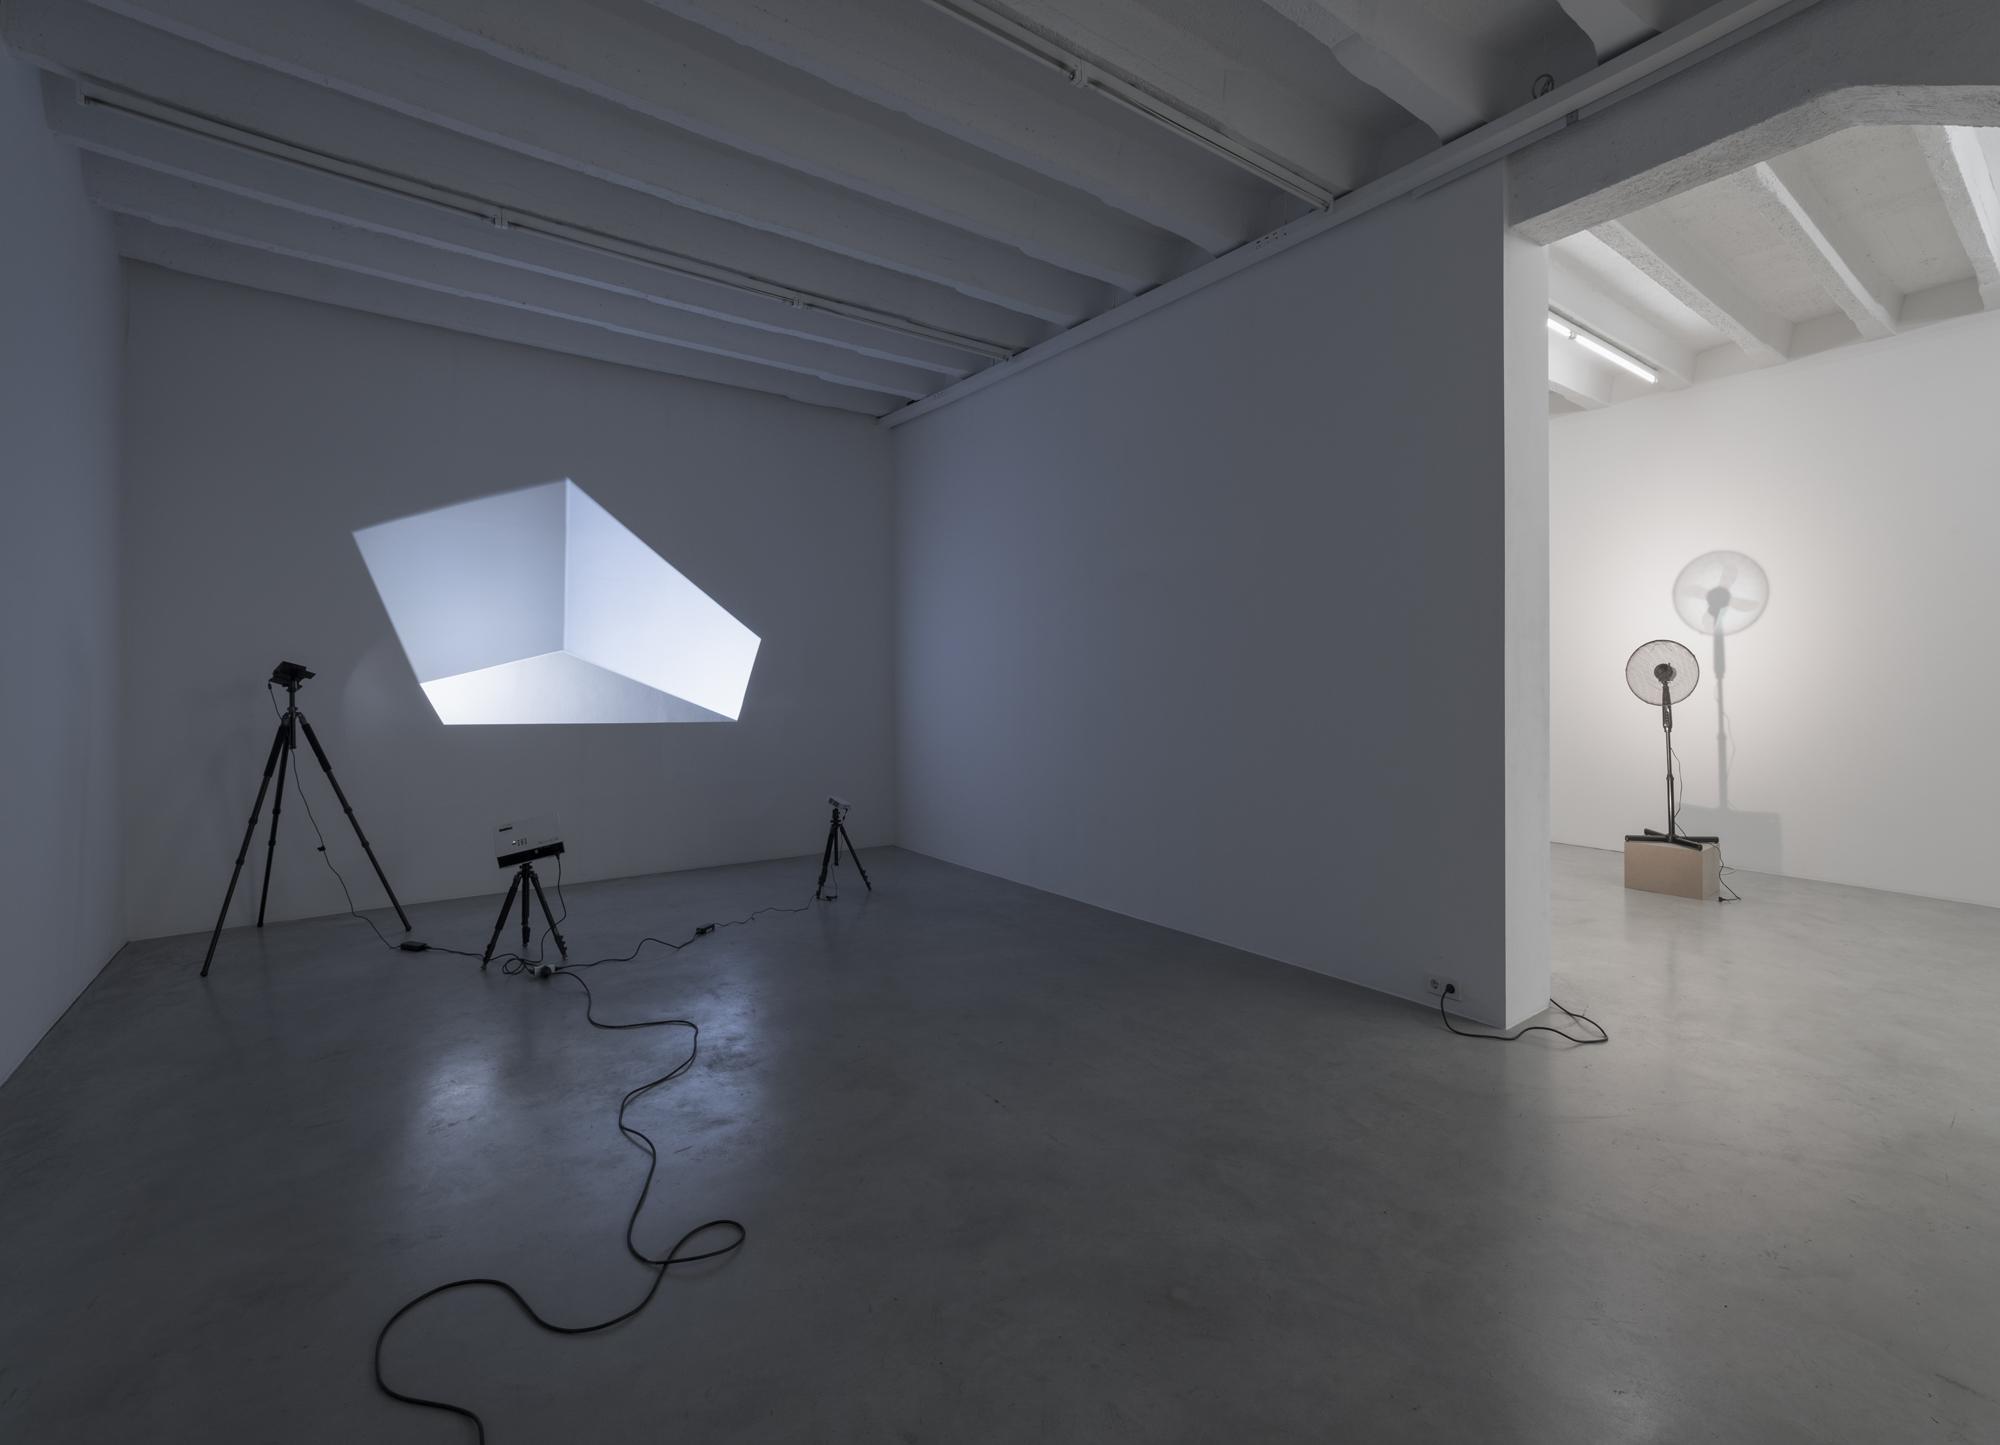 Vadim FISHKIN, Light Solidarity, exhibition view, Galerija Gregor Podnar, Berlin 2017. Photo: Marcus Schneider